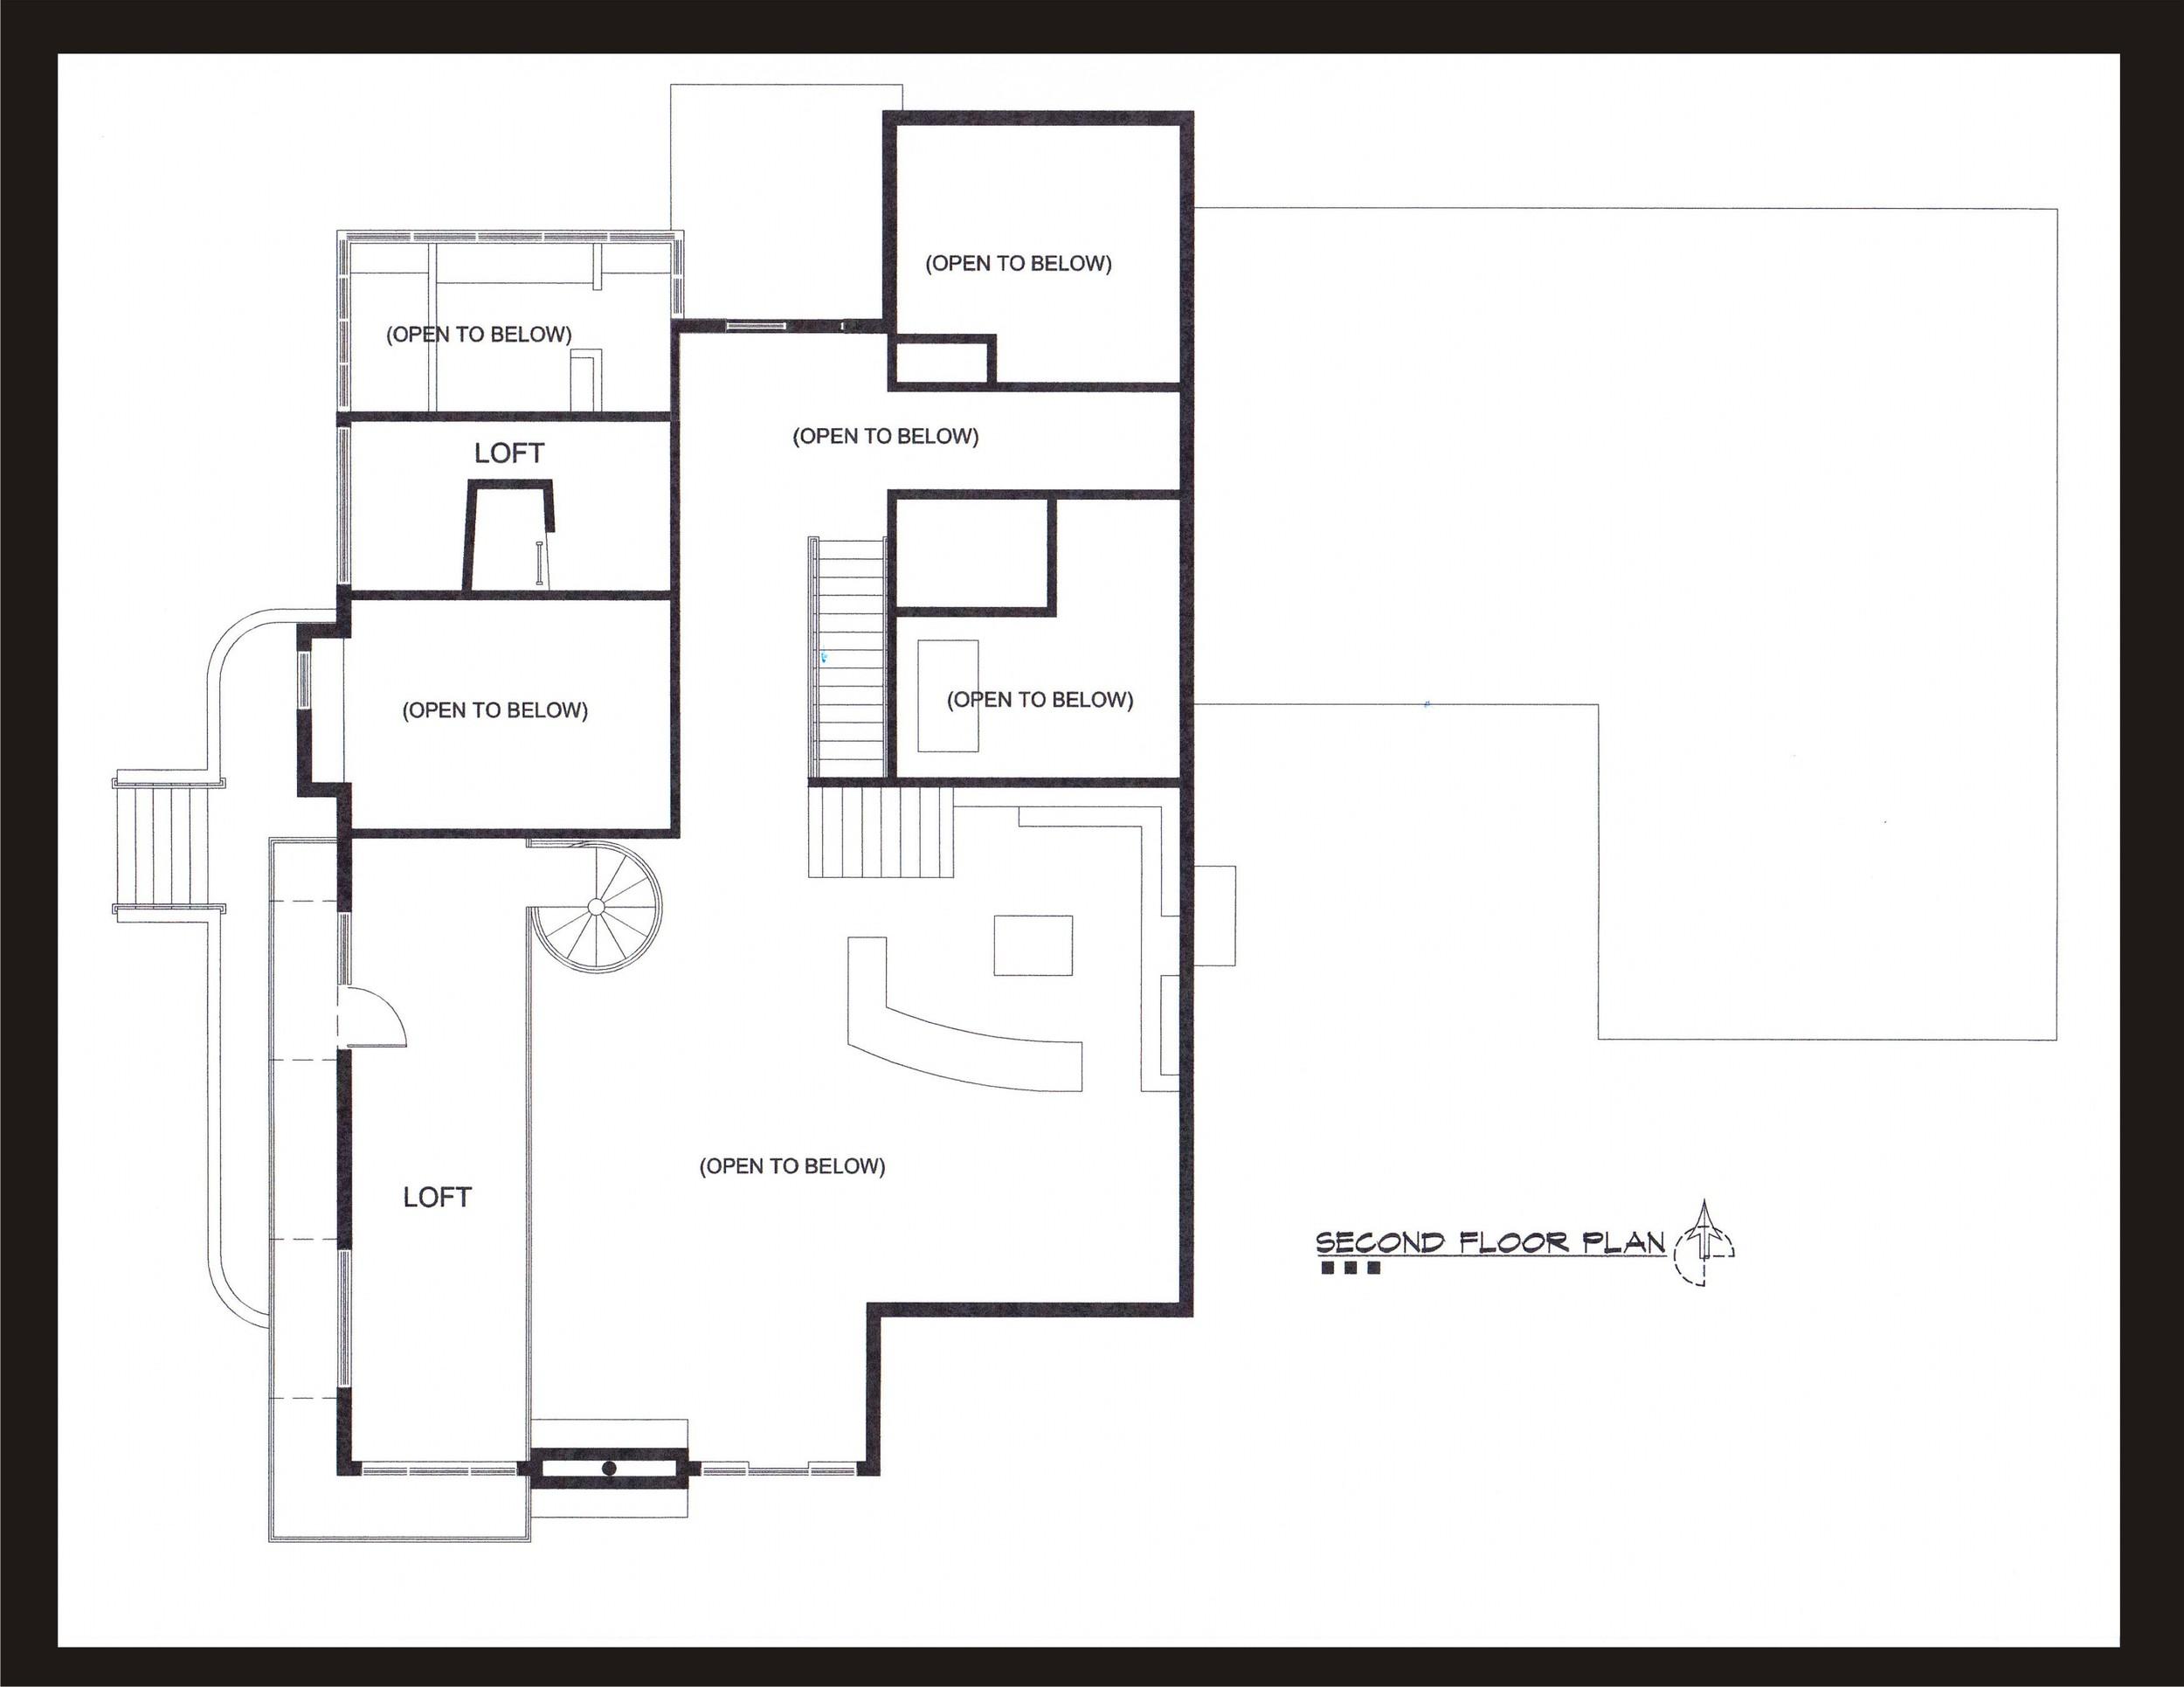 Hafke second floor plan_MI11.jpg